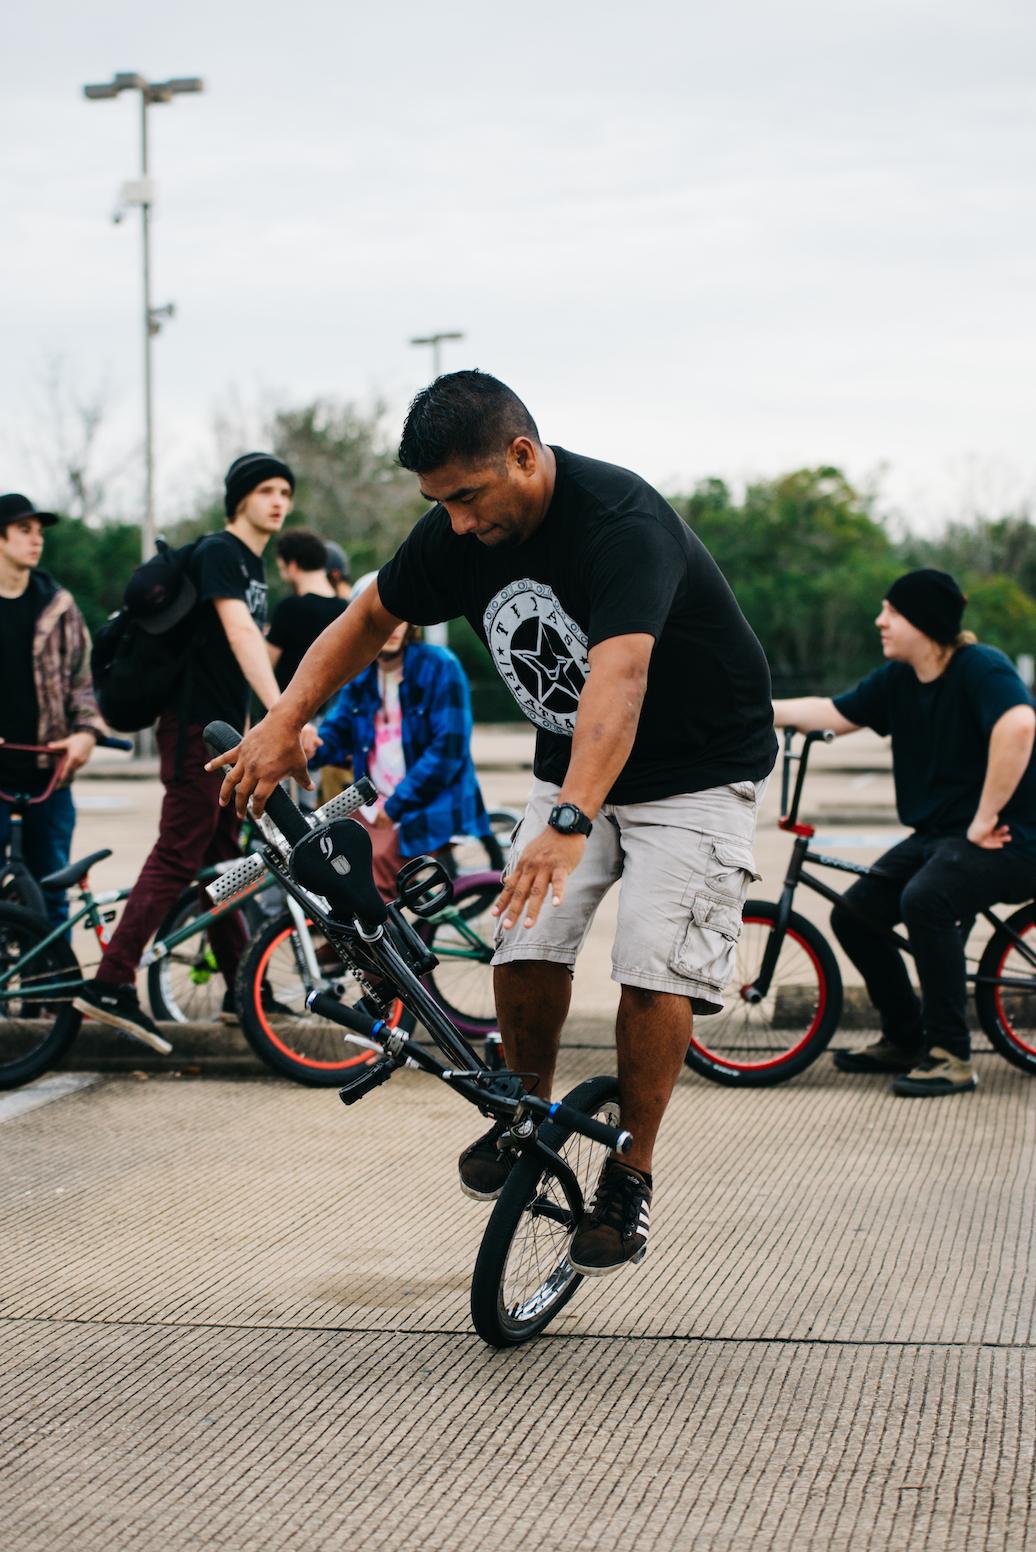 180107 sunday street rides_KirbyCrumpler_HALF_4.jpg